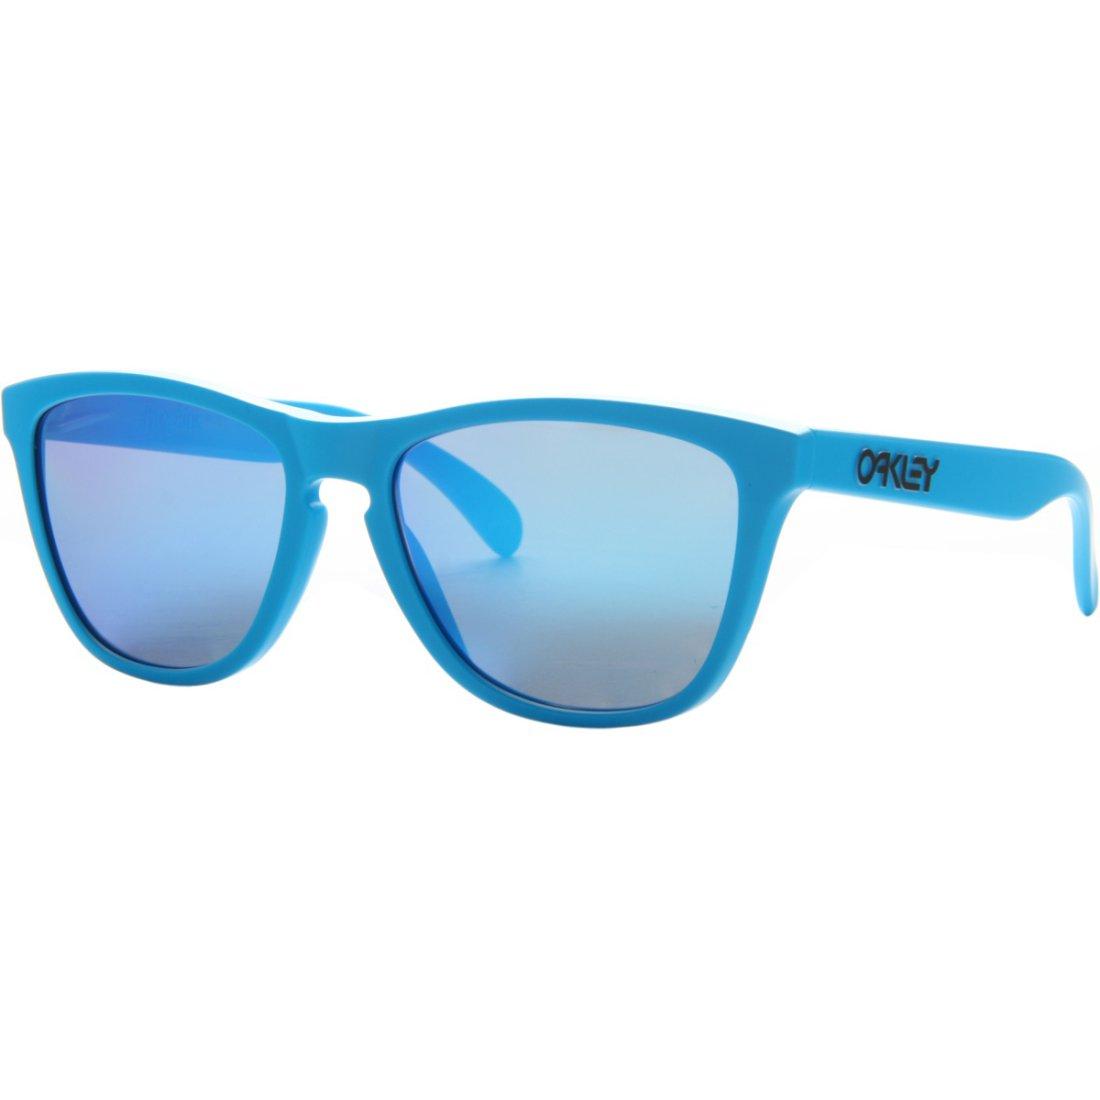 442eb1dcad OAKLEY Frogskins Matte Sky   Sapphire Iridium Sun glasses · Motocard